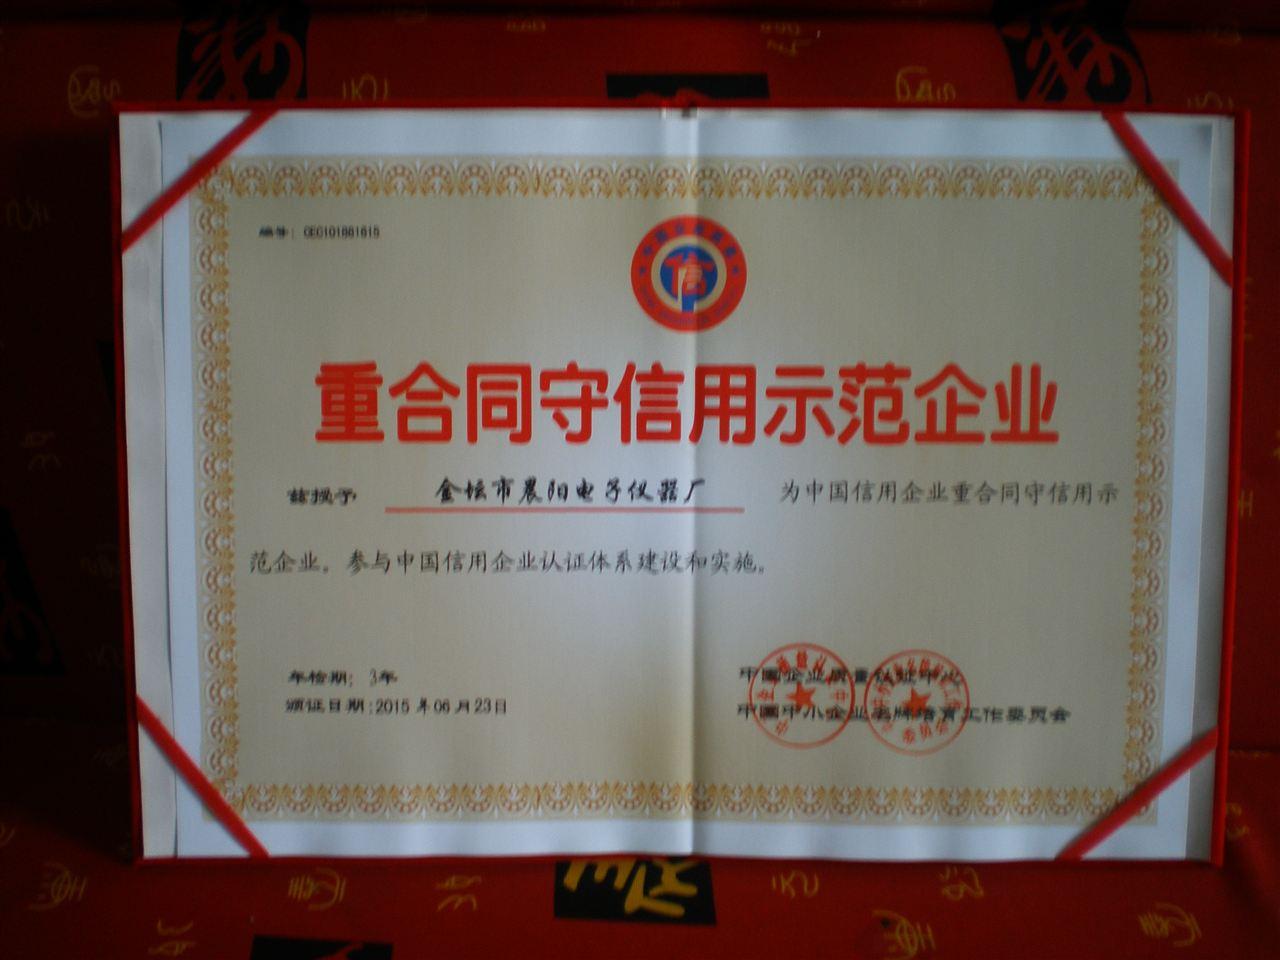 重合同证书